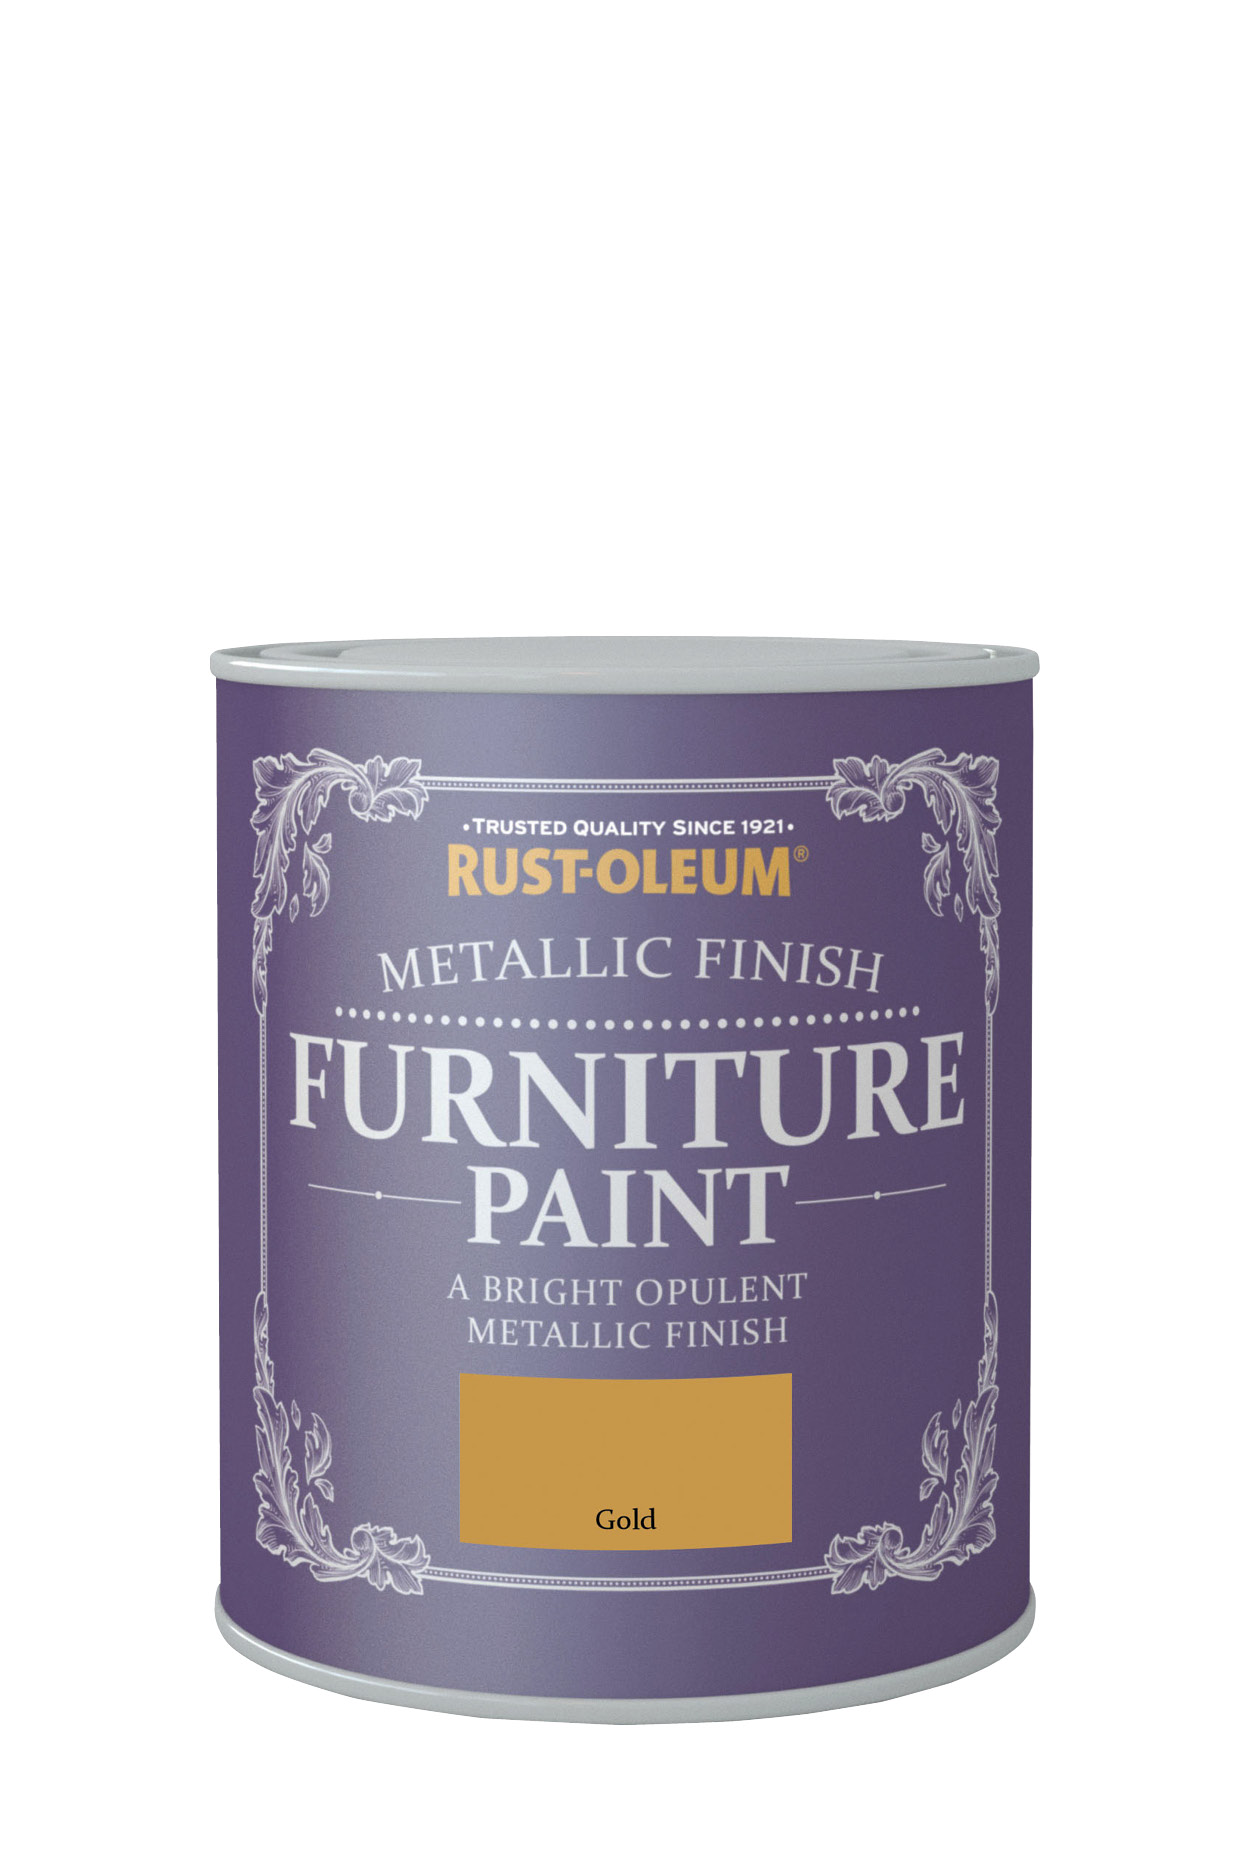 Metallic Finish Furniture Paint 750ml